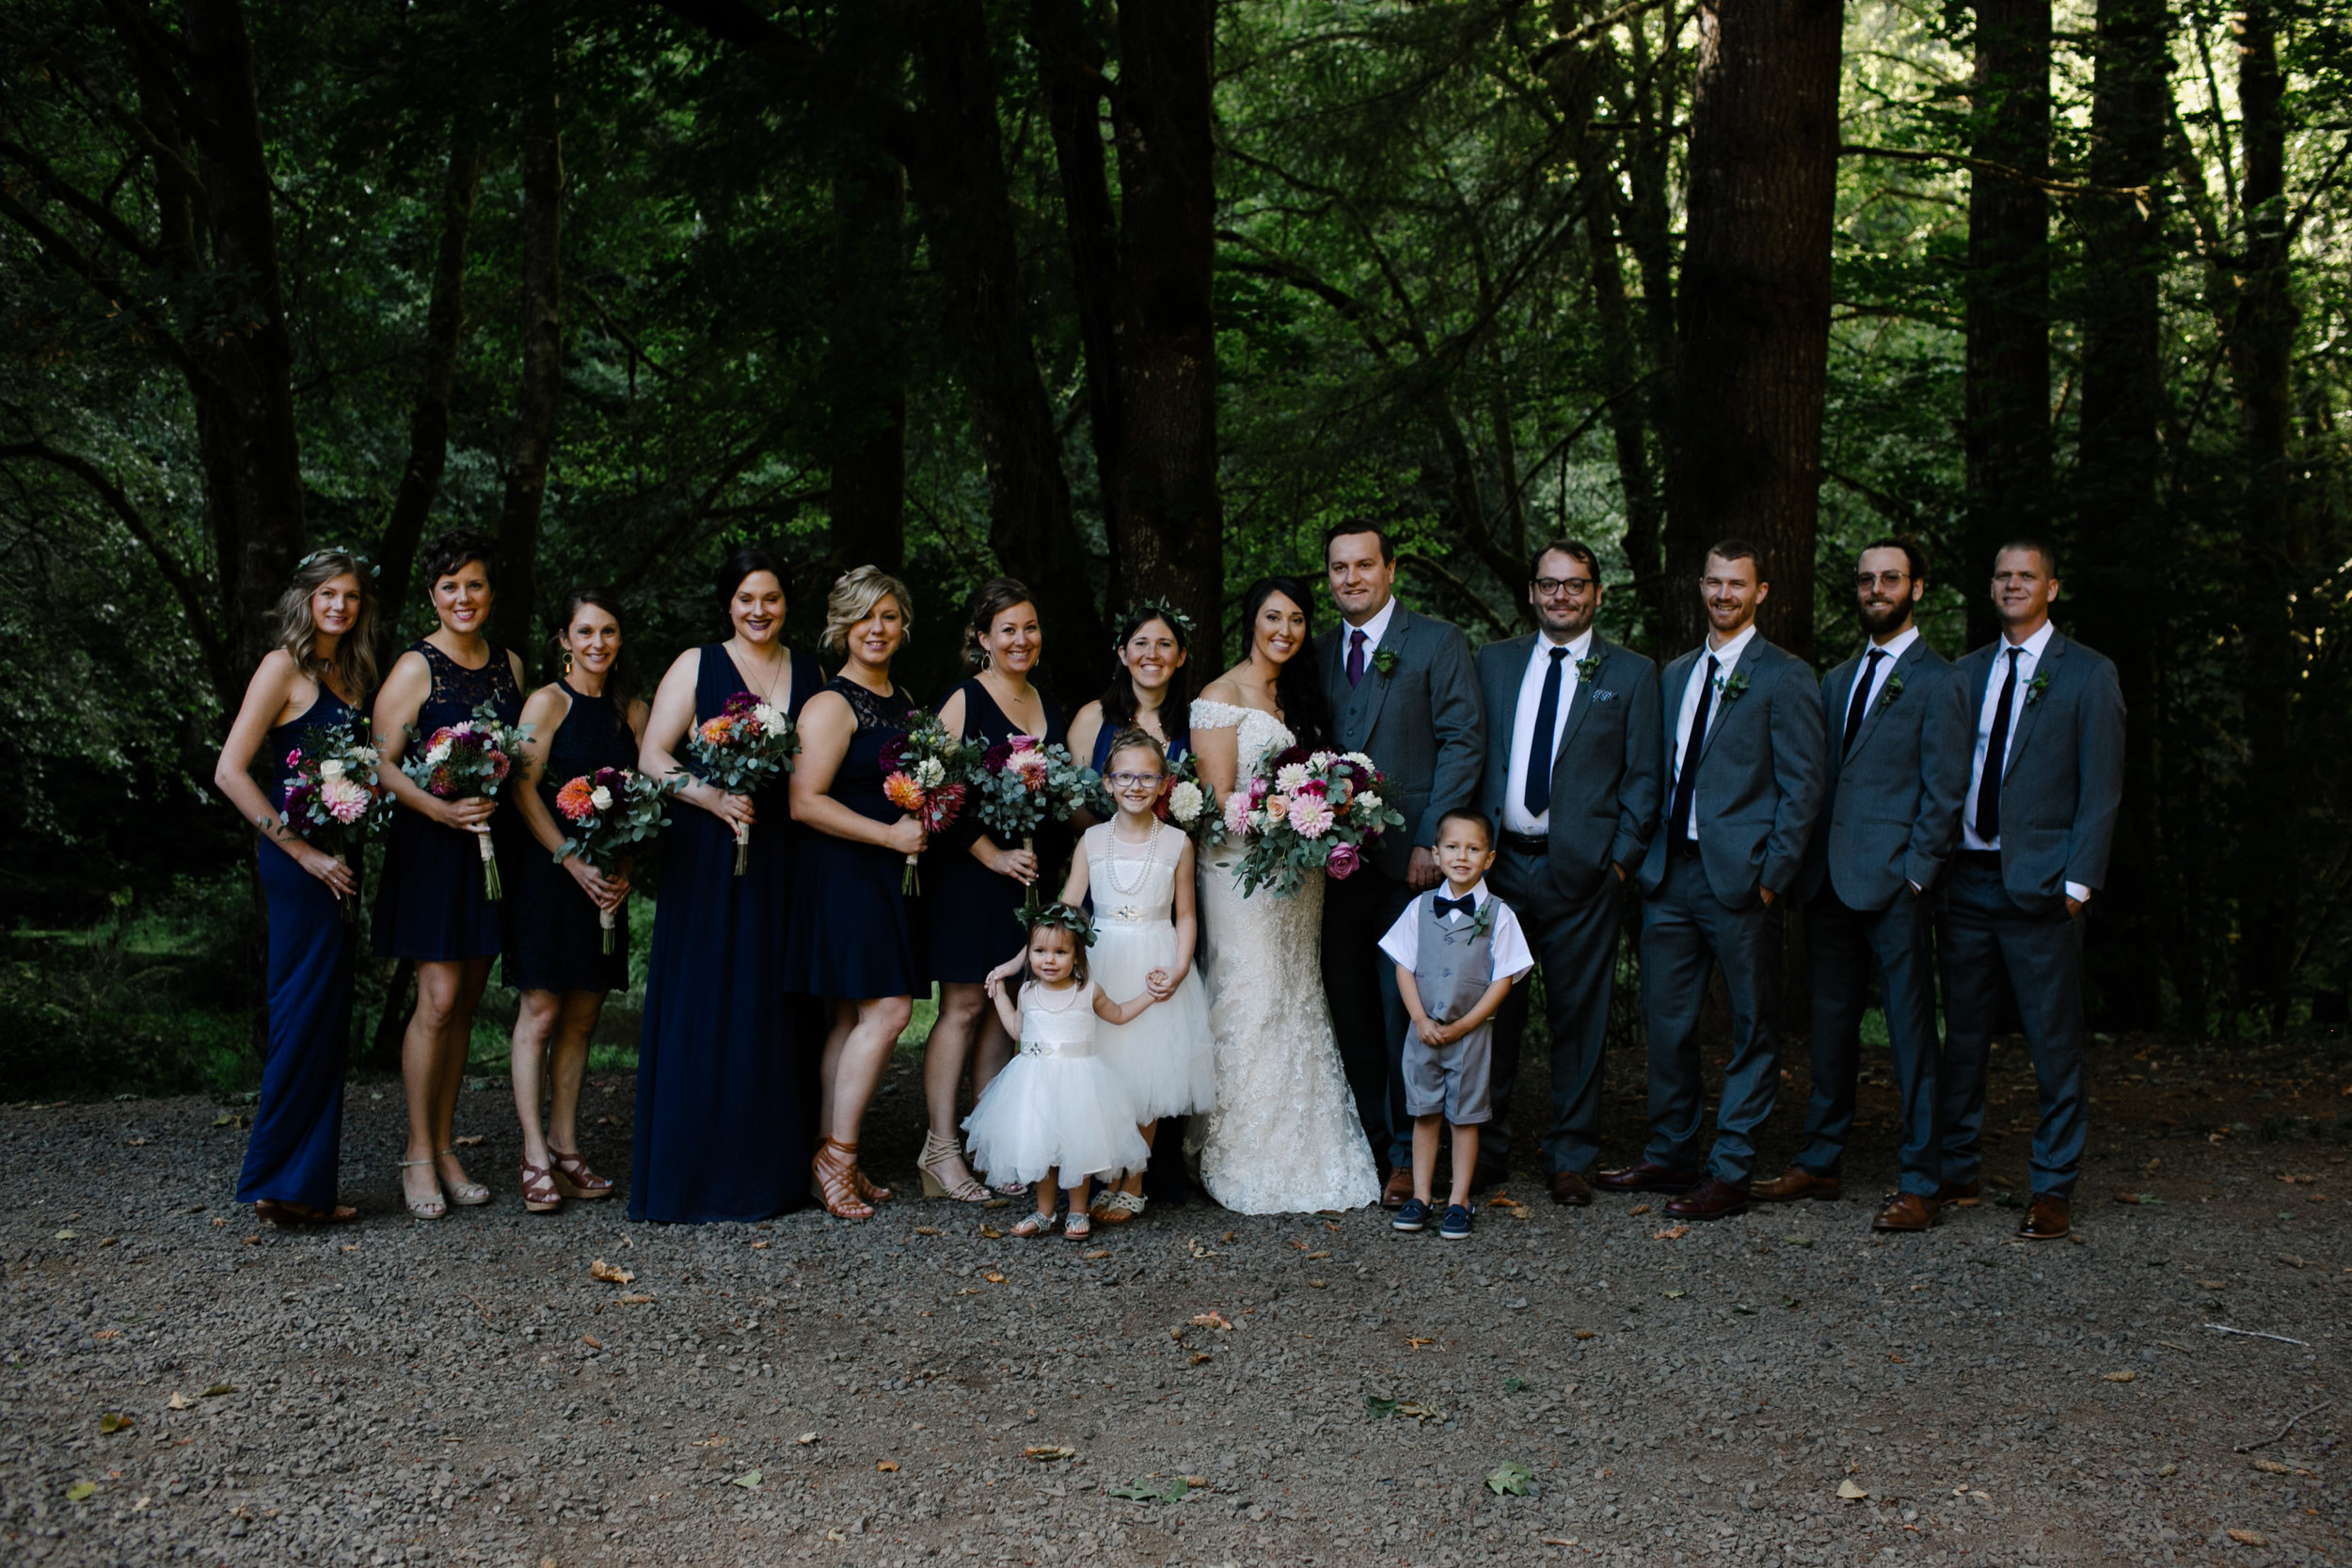 Sevlynn-Photography-Teresa-Chandler-Wedding-26.jpg